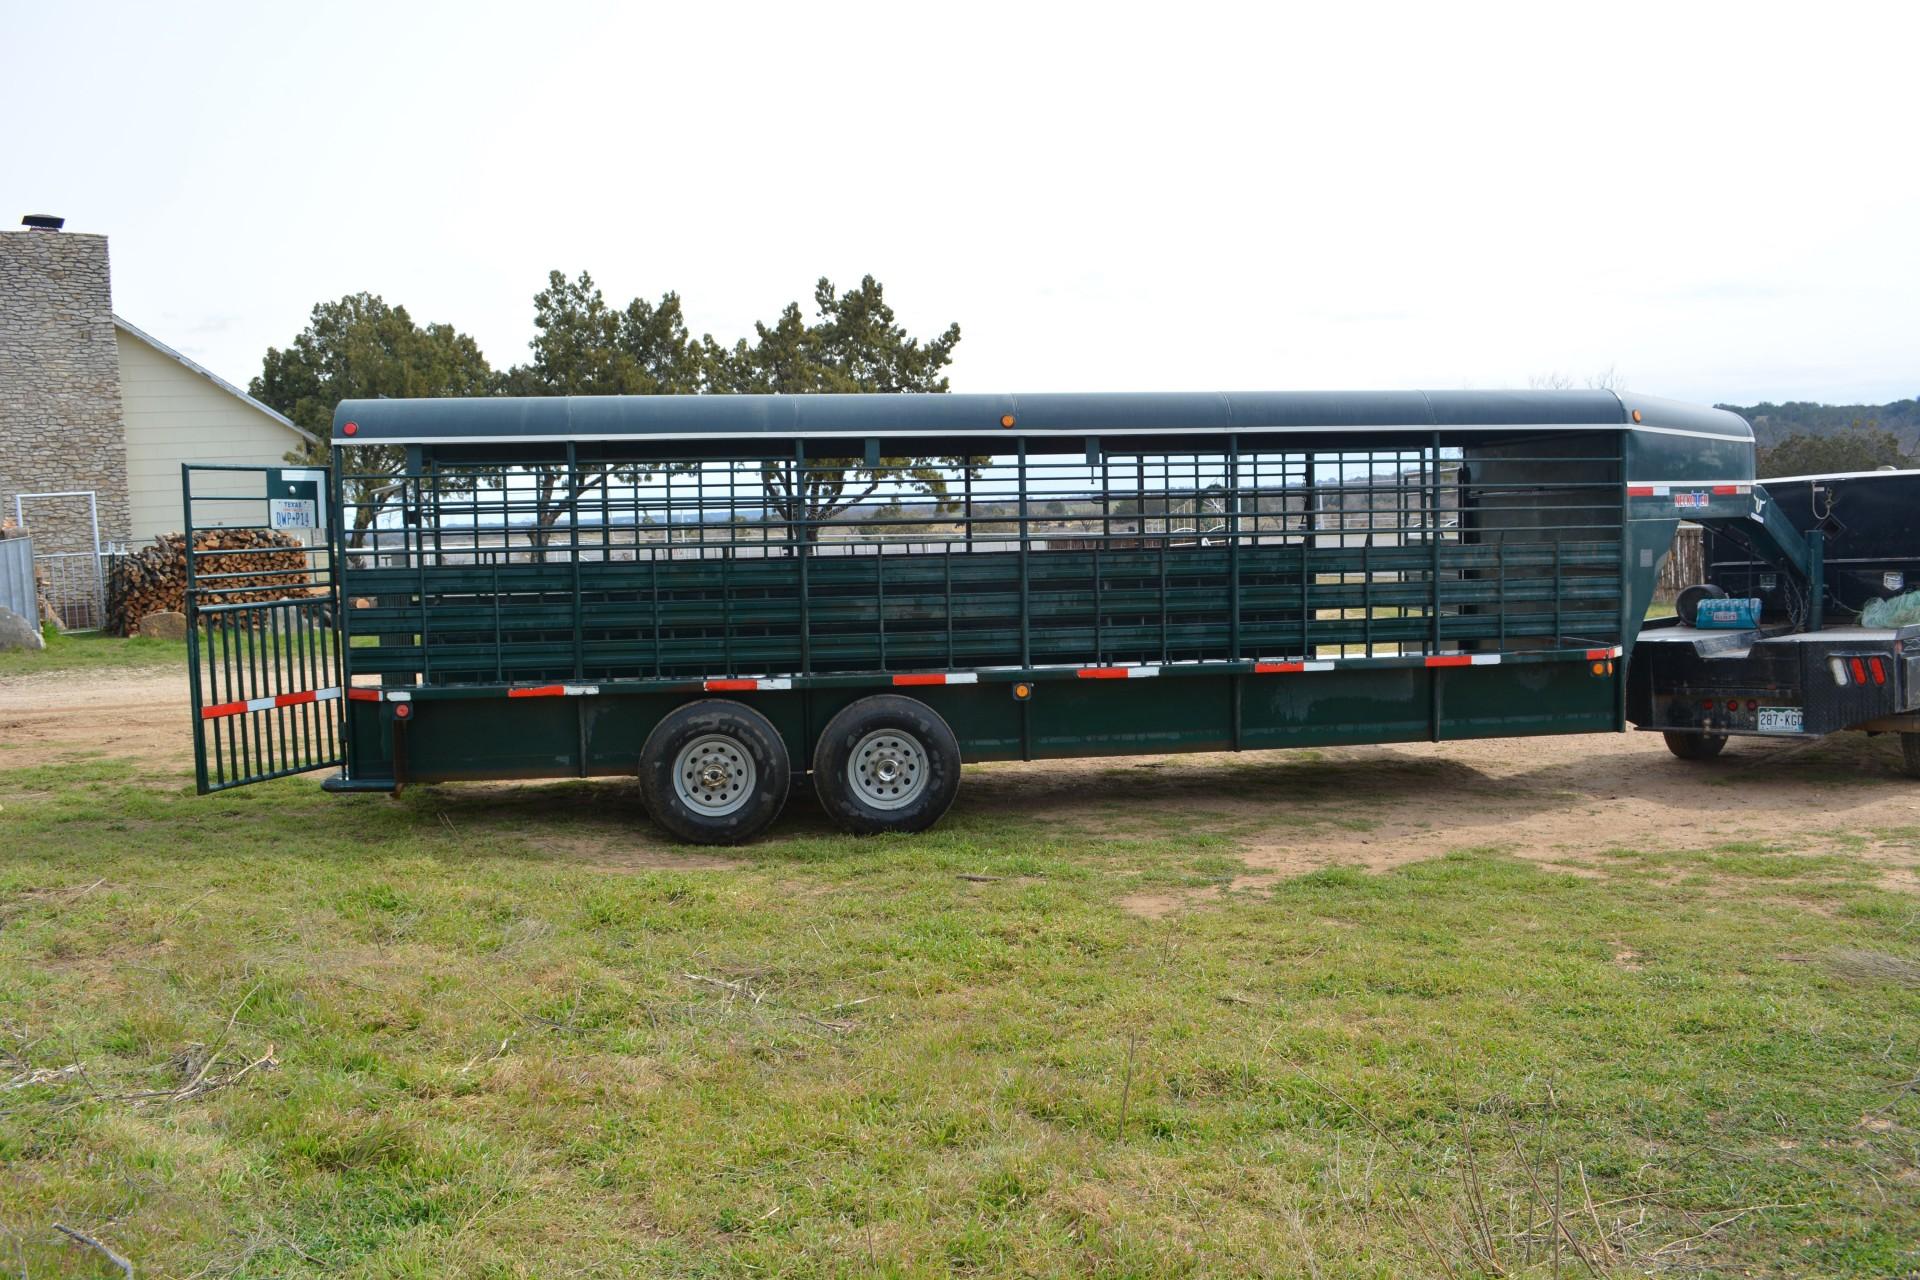 2011 Neckover stock trailer